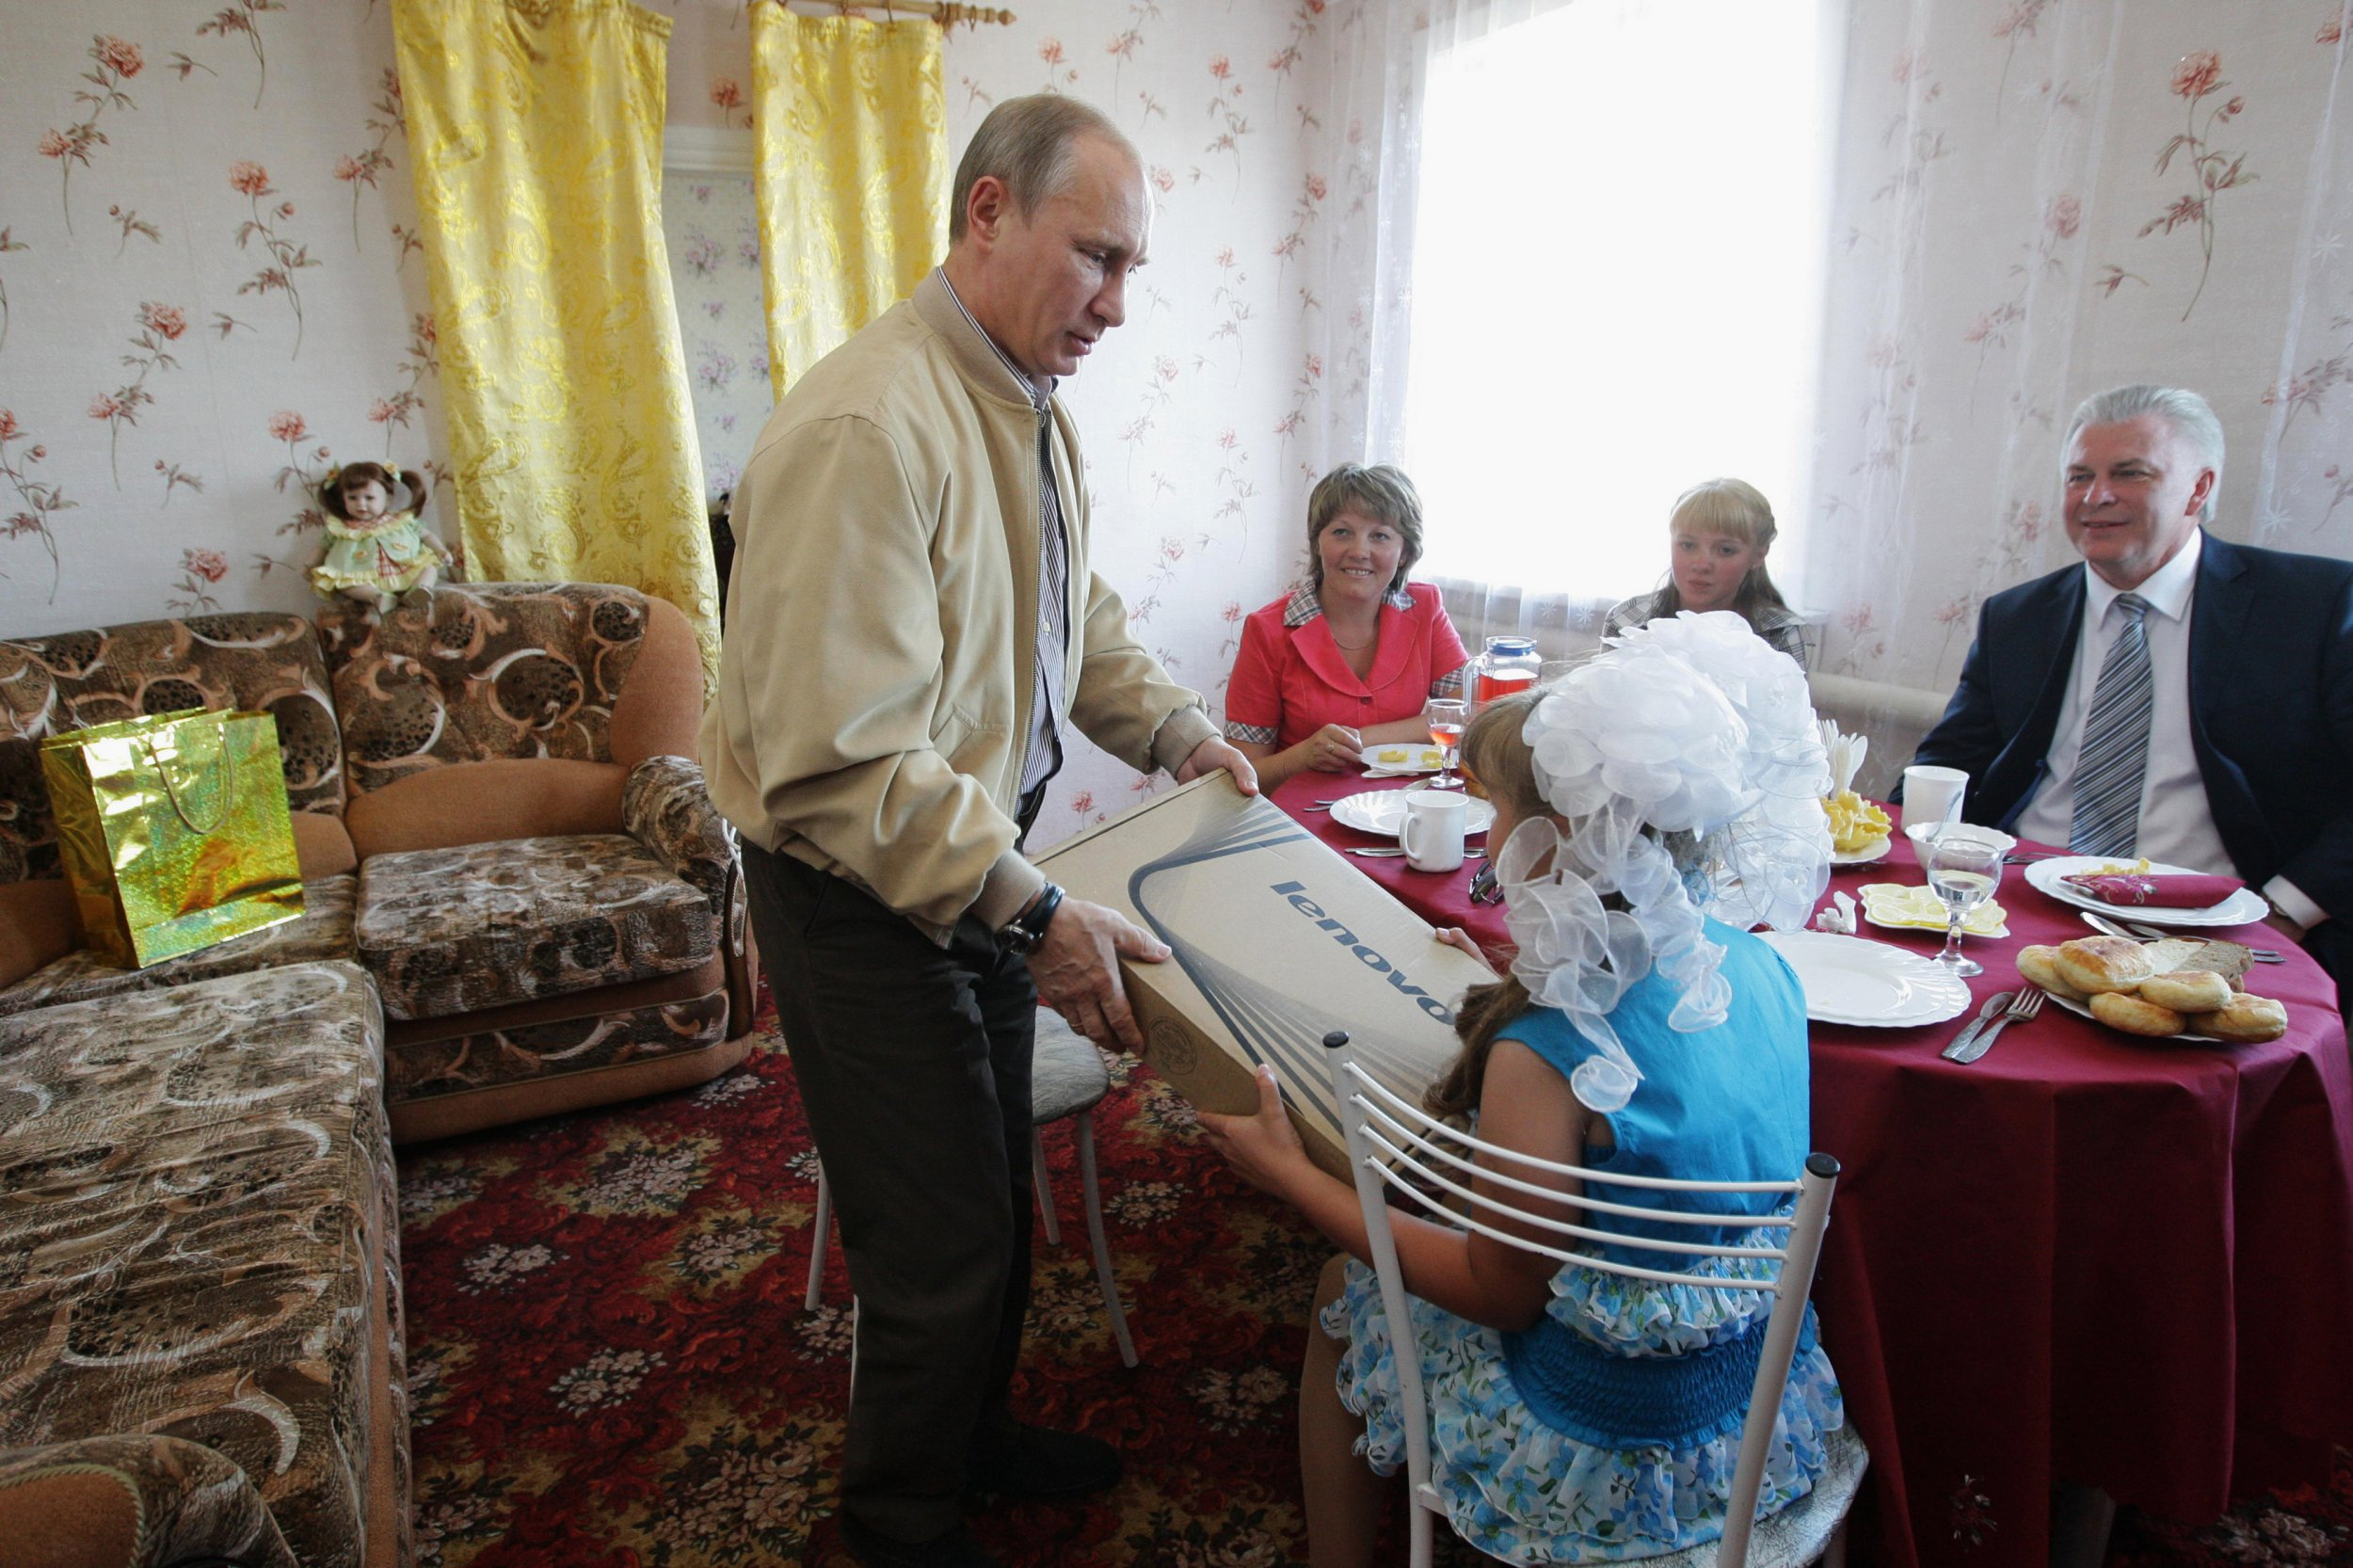 Putin with computer